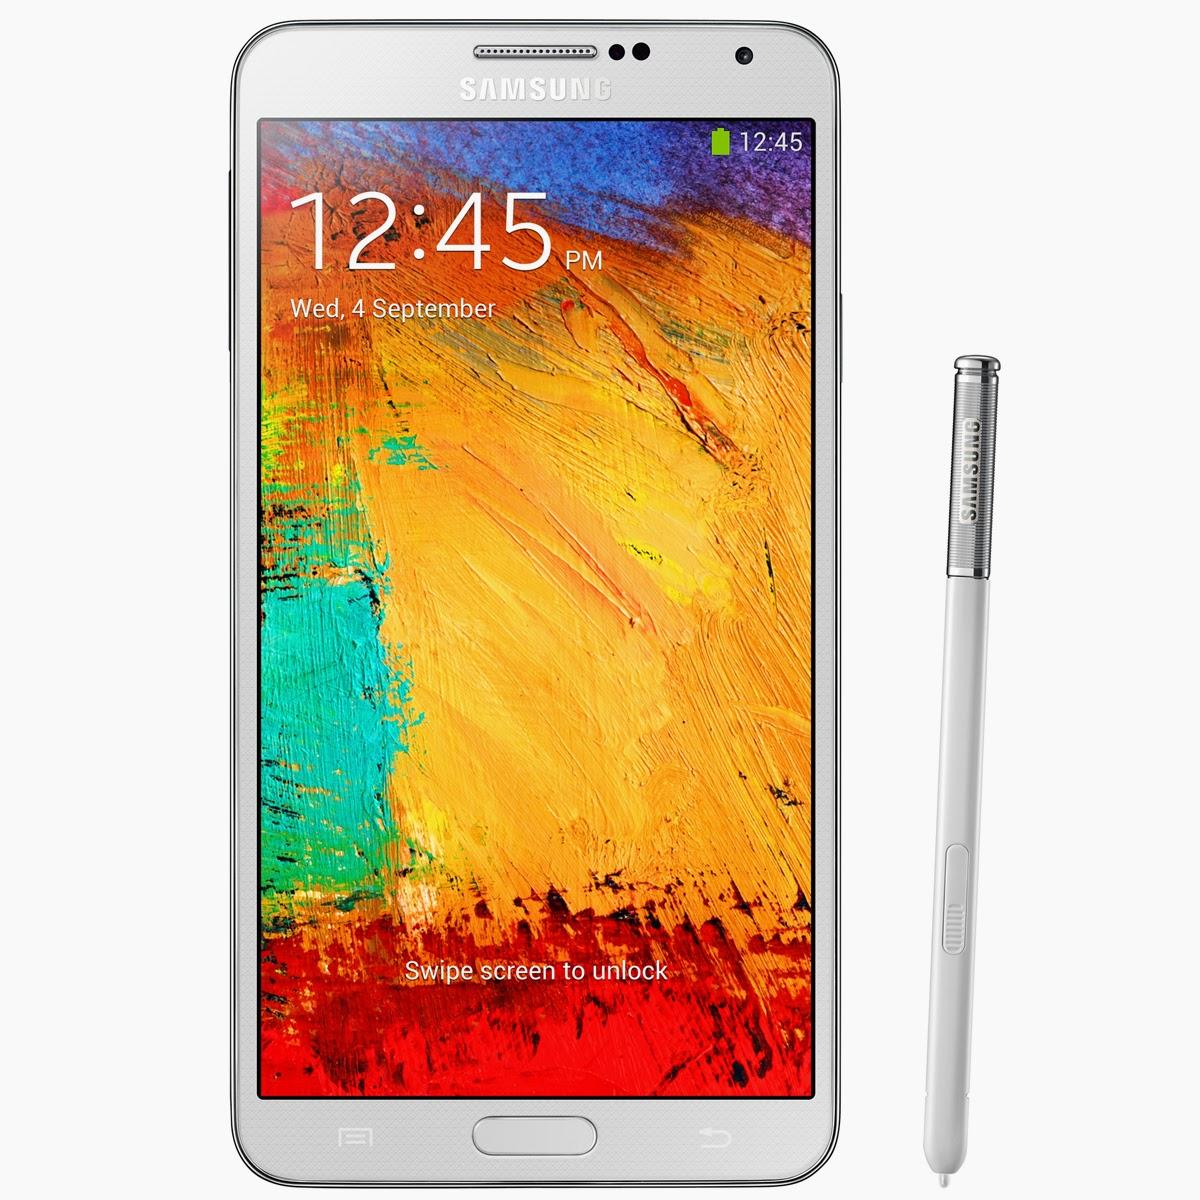 samsung galaxy note 3 blanc comparaison smartphone comparatif smartphones. Black Bedroom Furniture Sets. Home Design Ideas